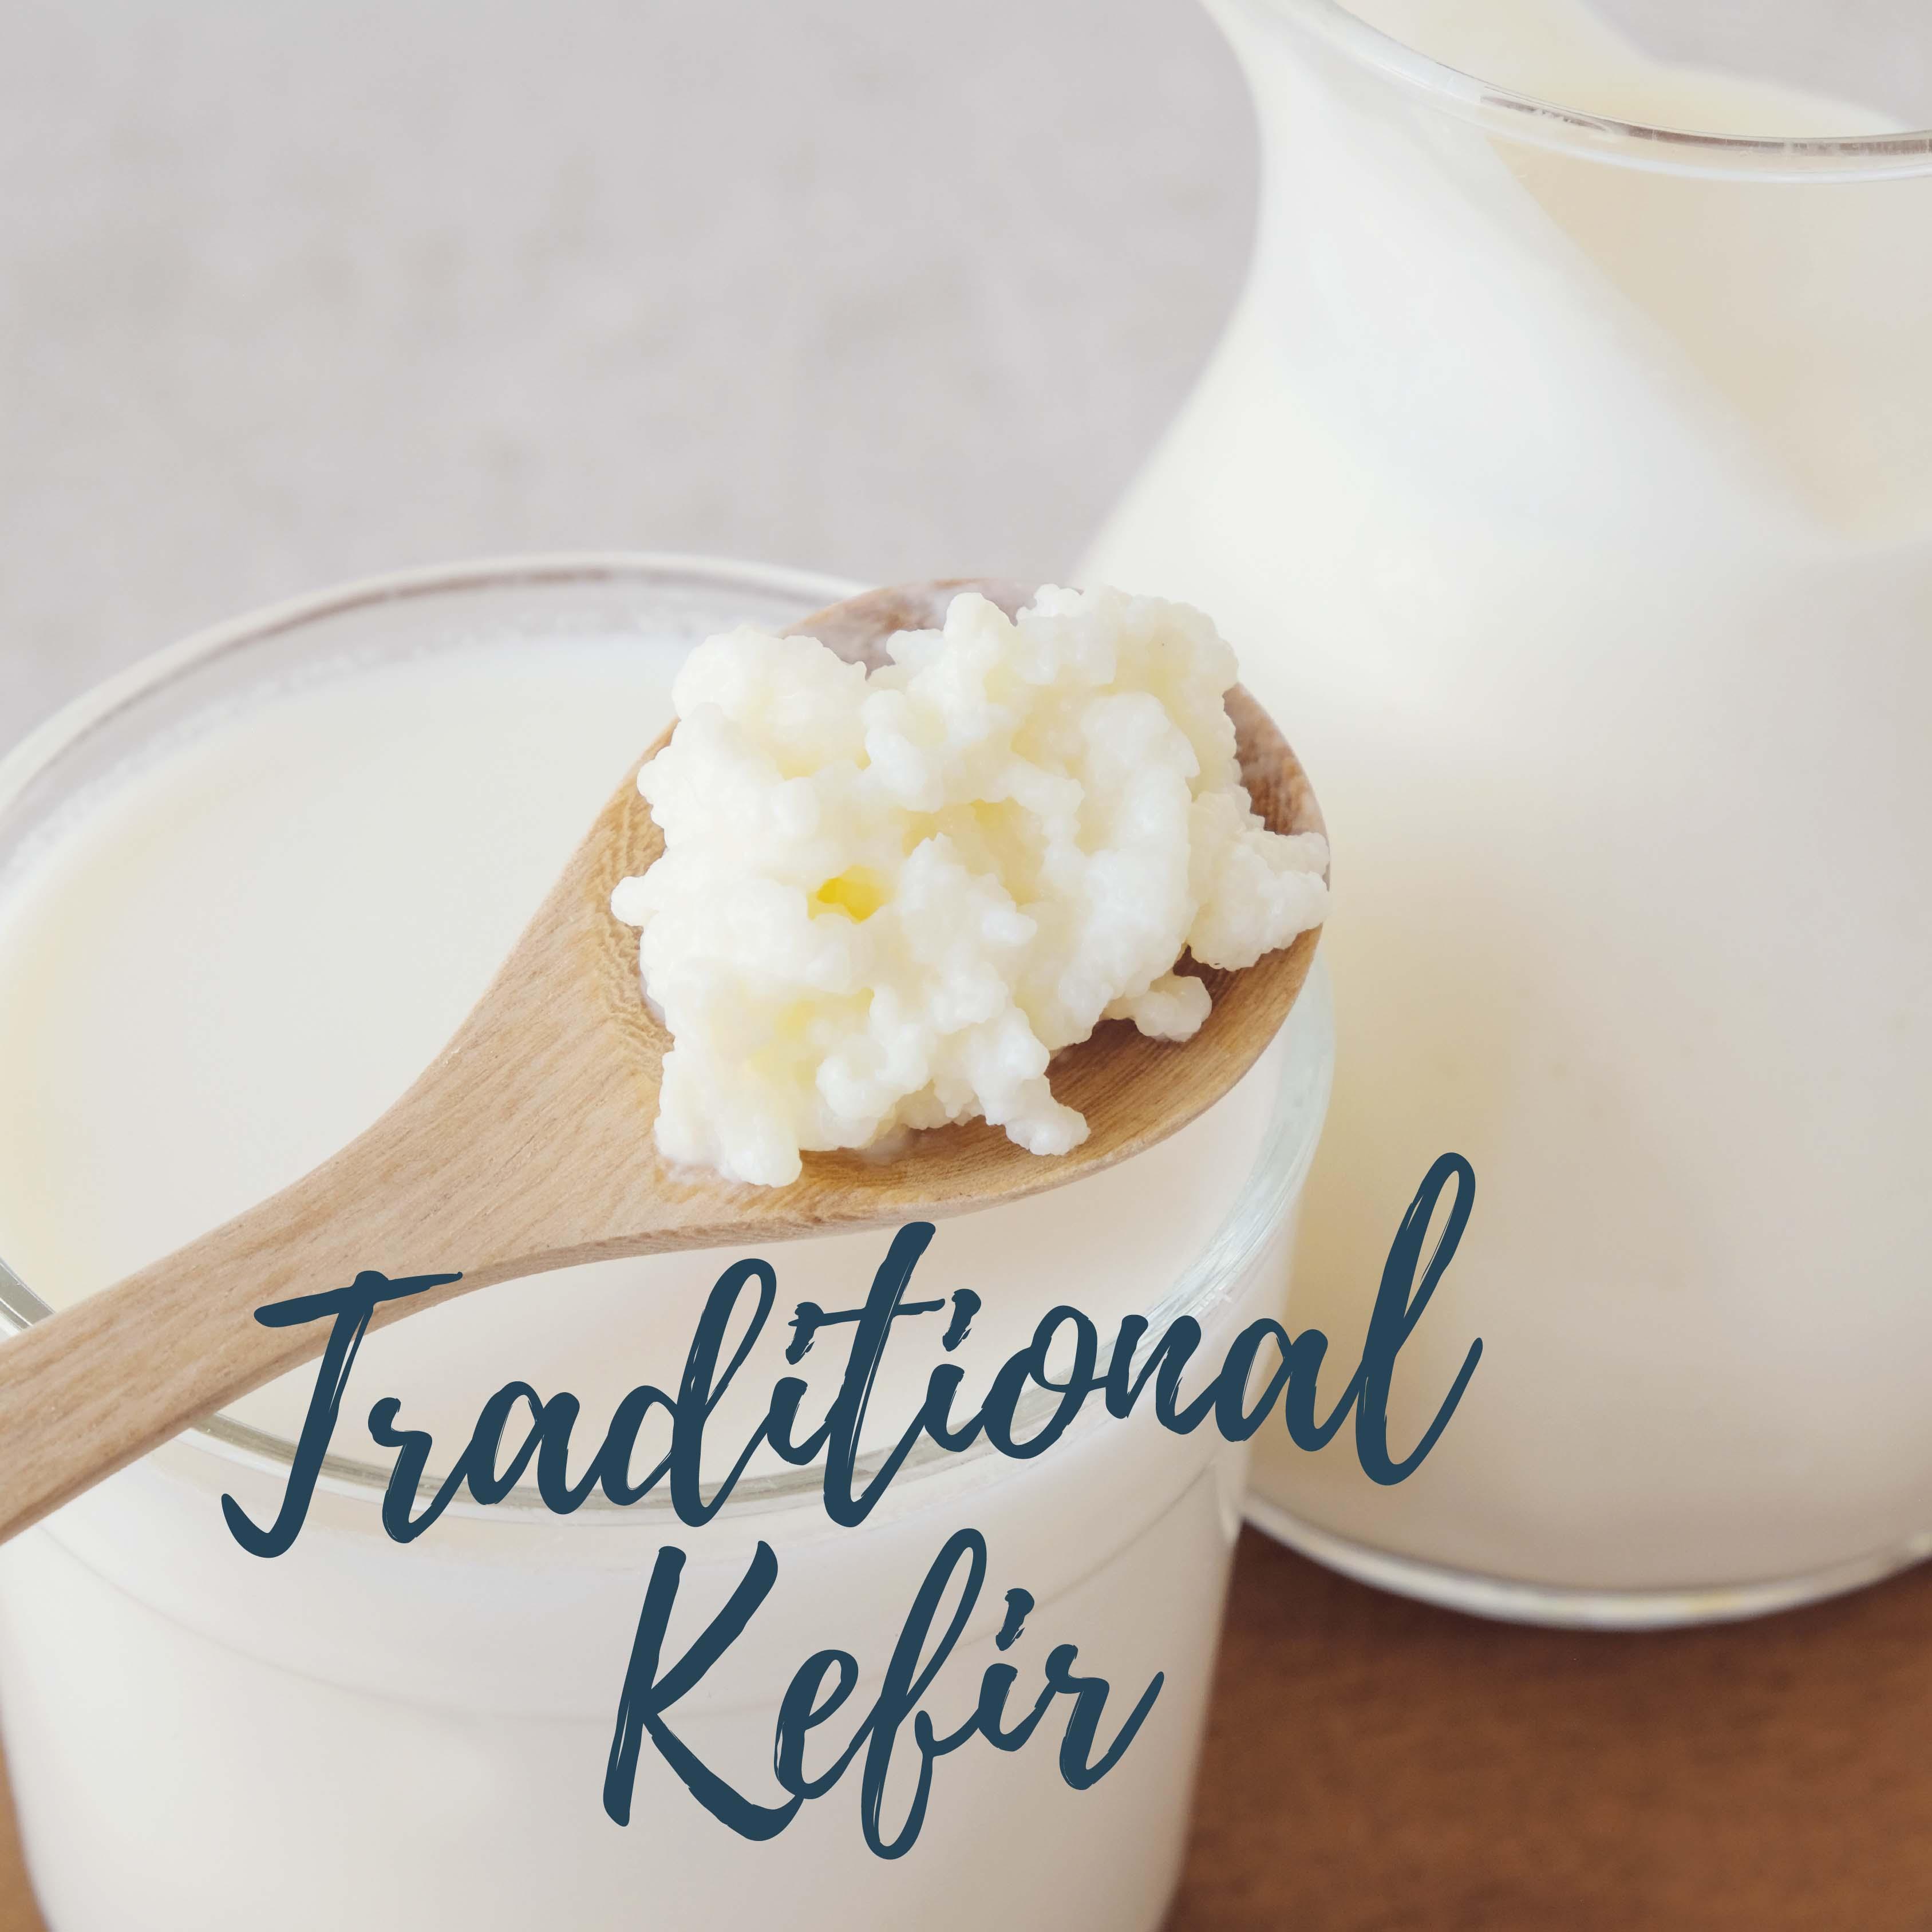 Traditional Kefir